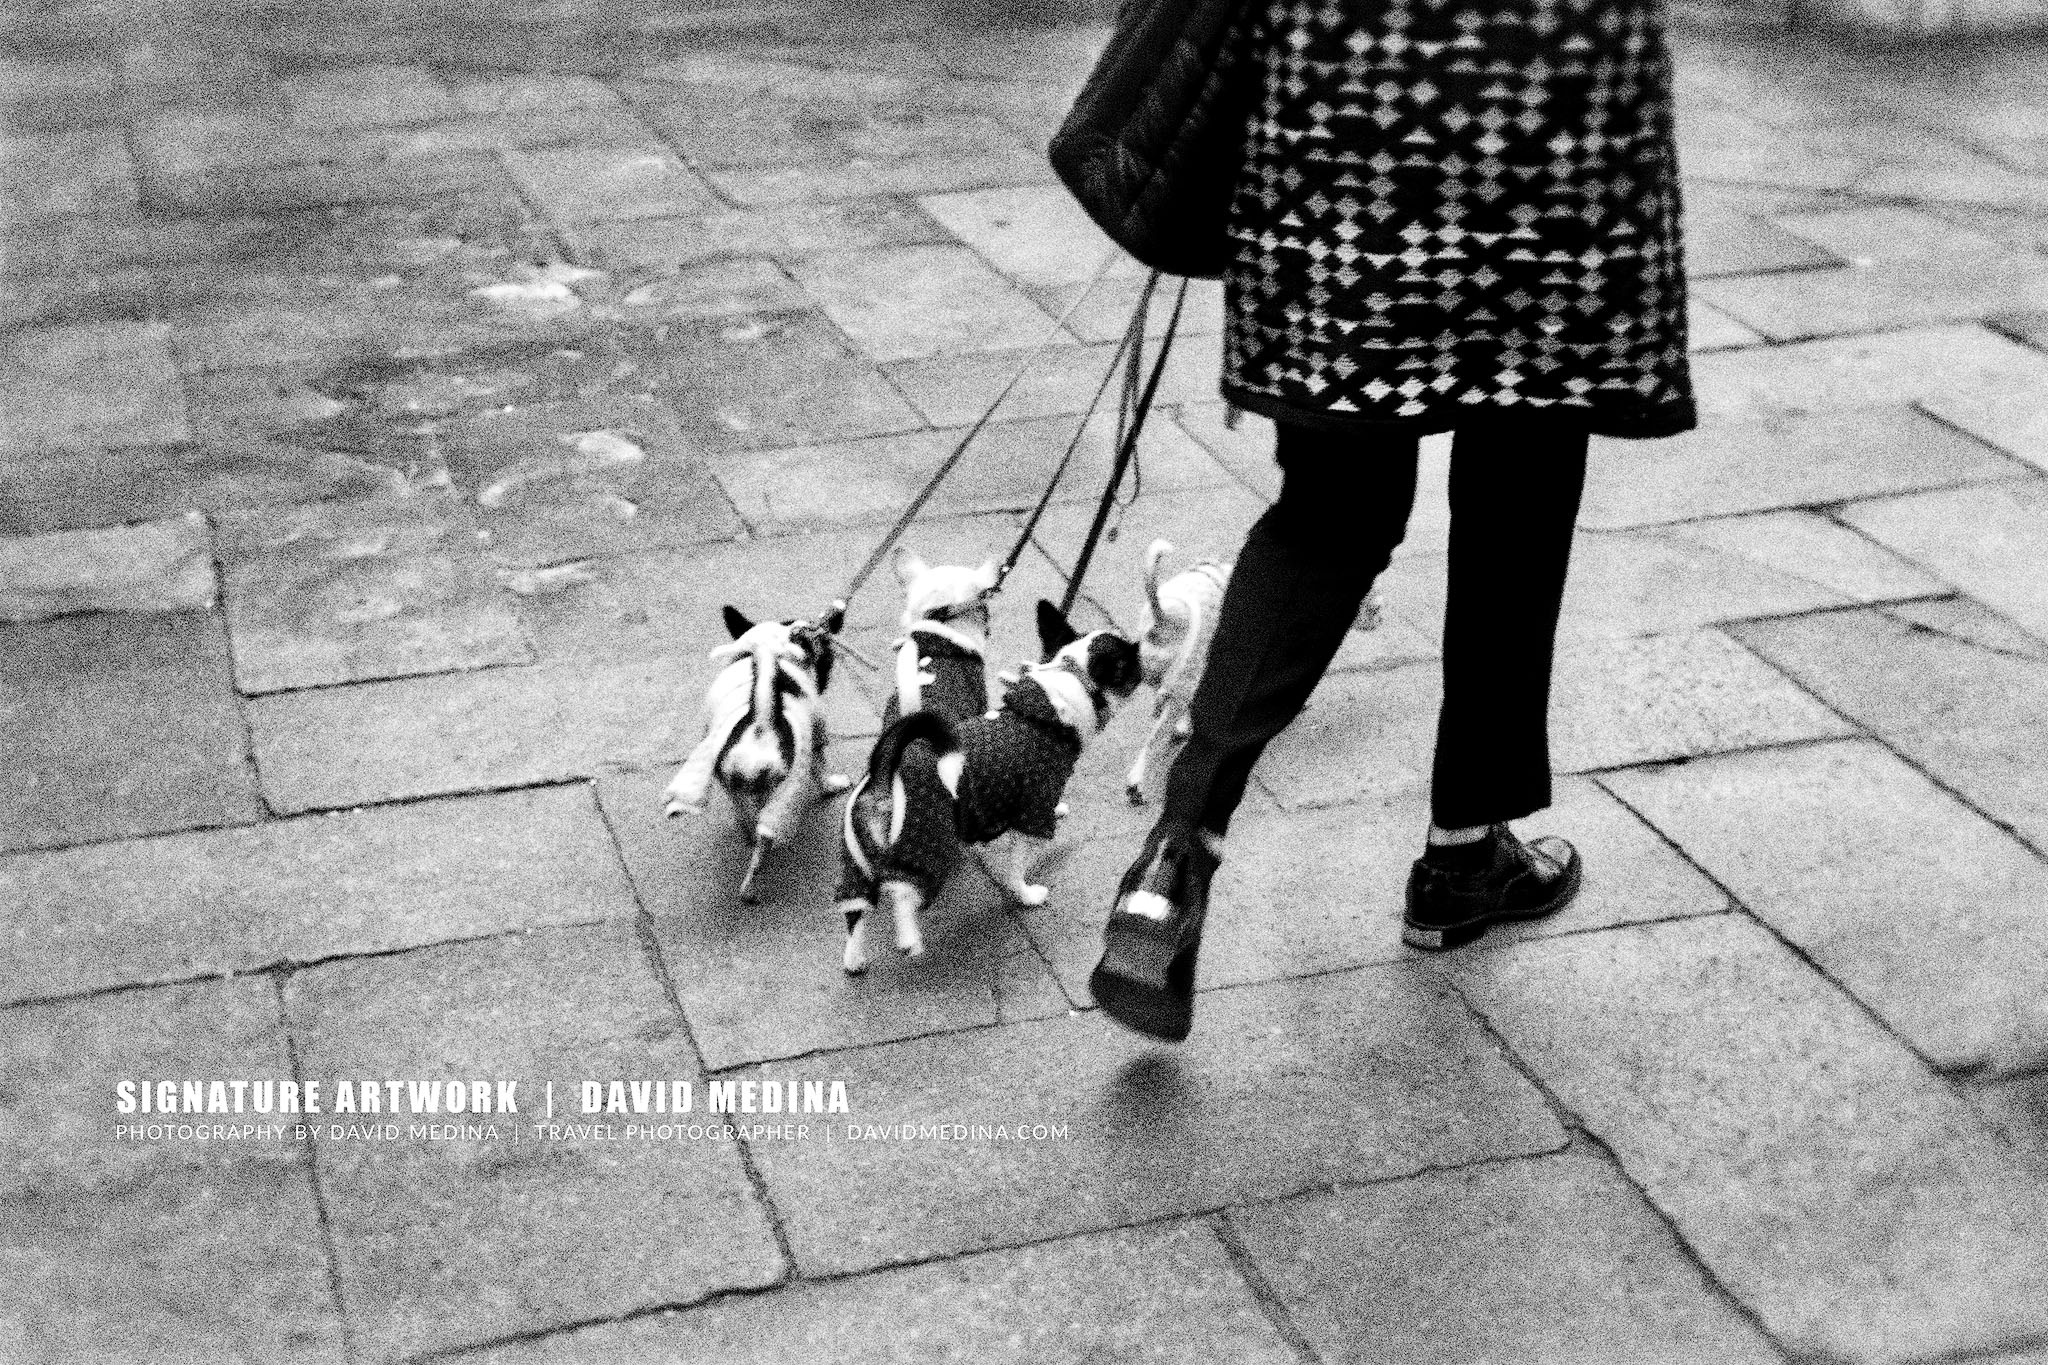 Walking the dogs by David Medina